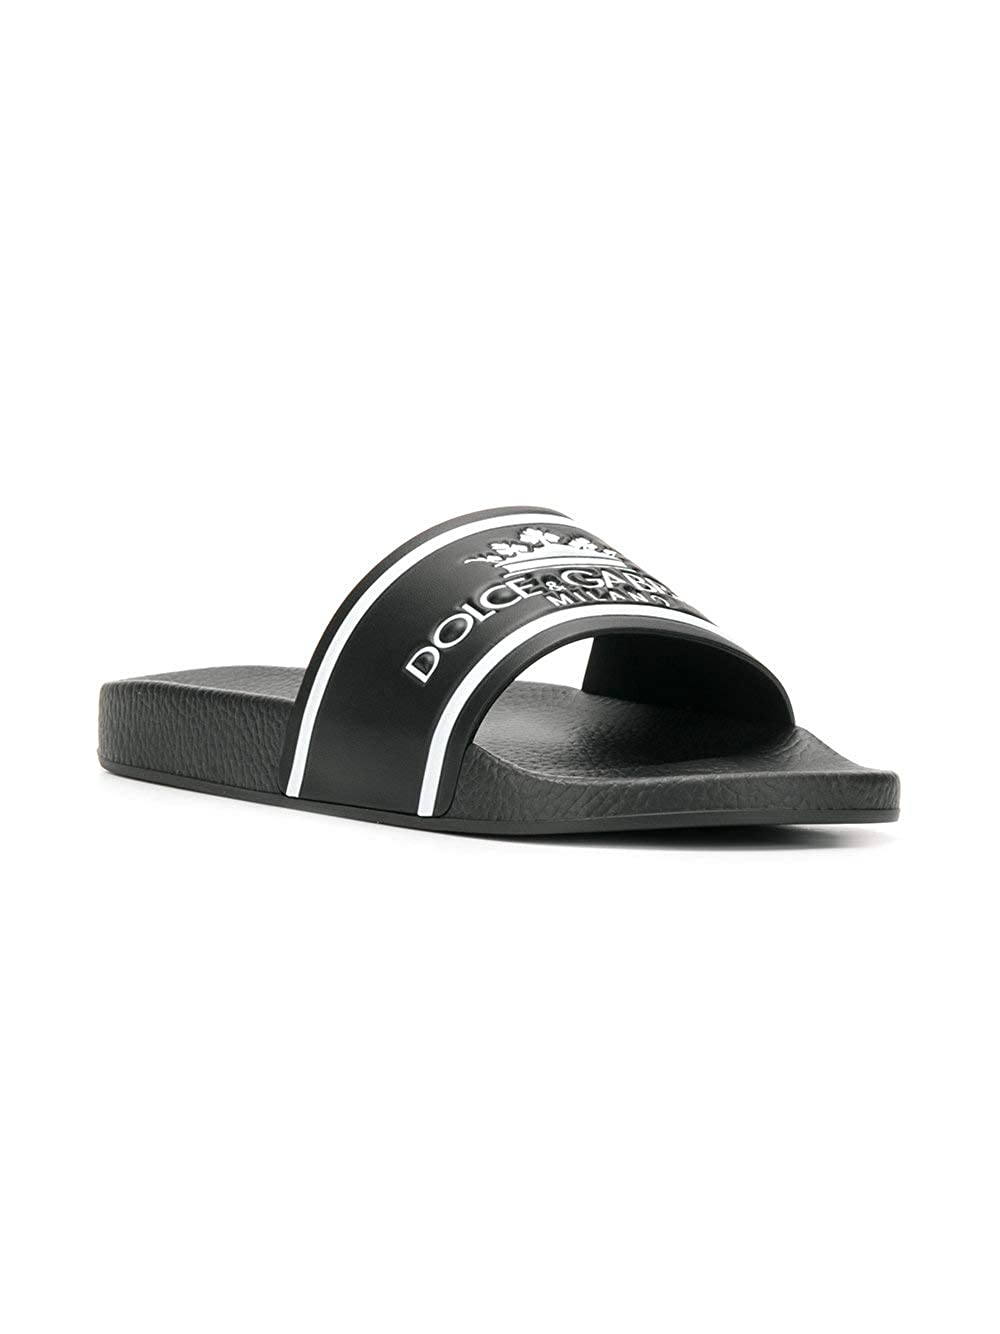 Dolce E Gabbana Sandali Uomo Cs1630au679hnr18 PVC Nero  Amazon.it  Scarpe e  borse 71347858a1c